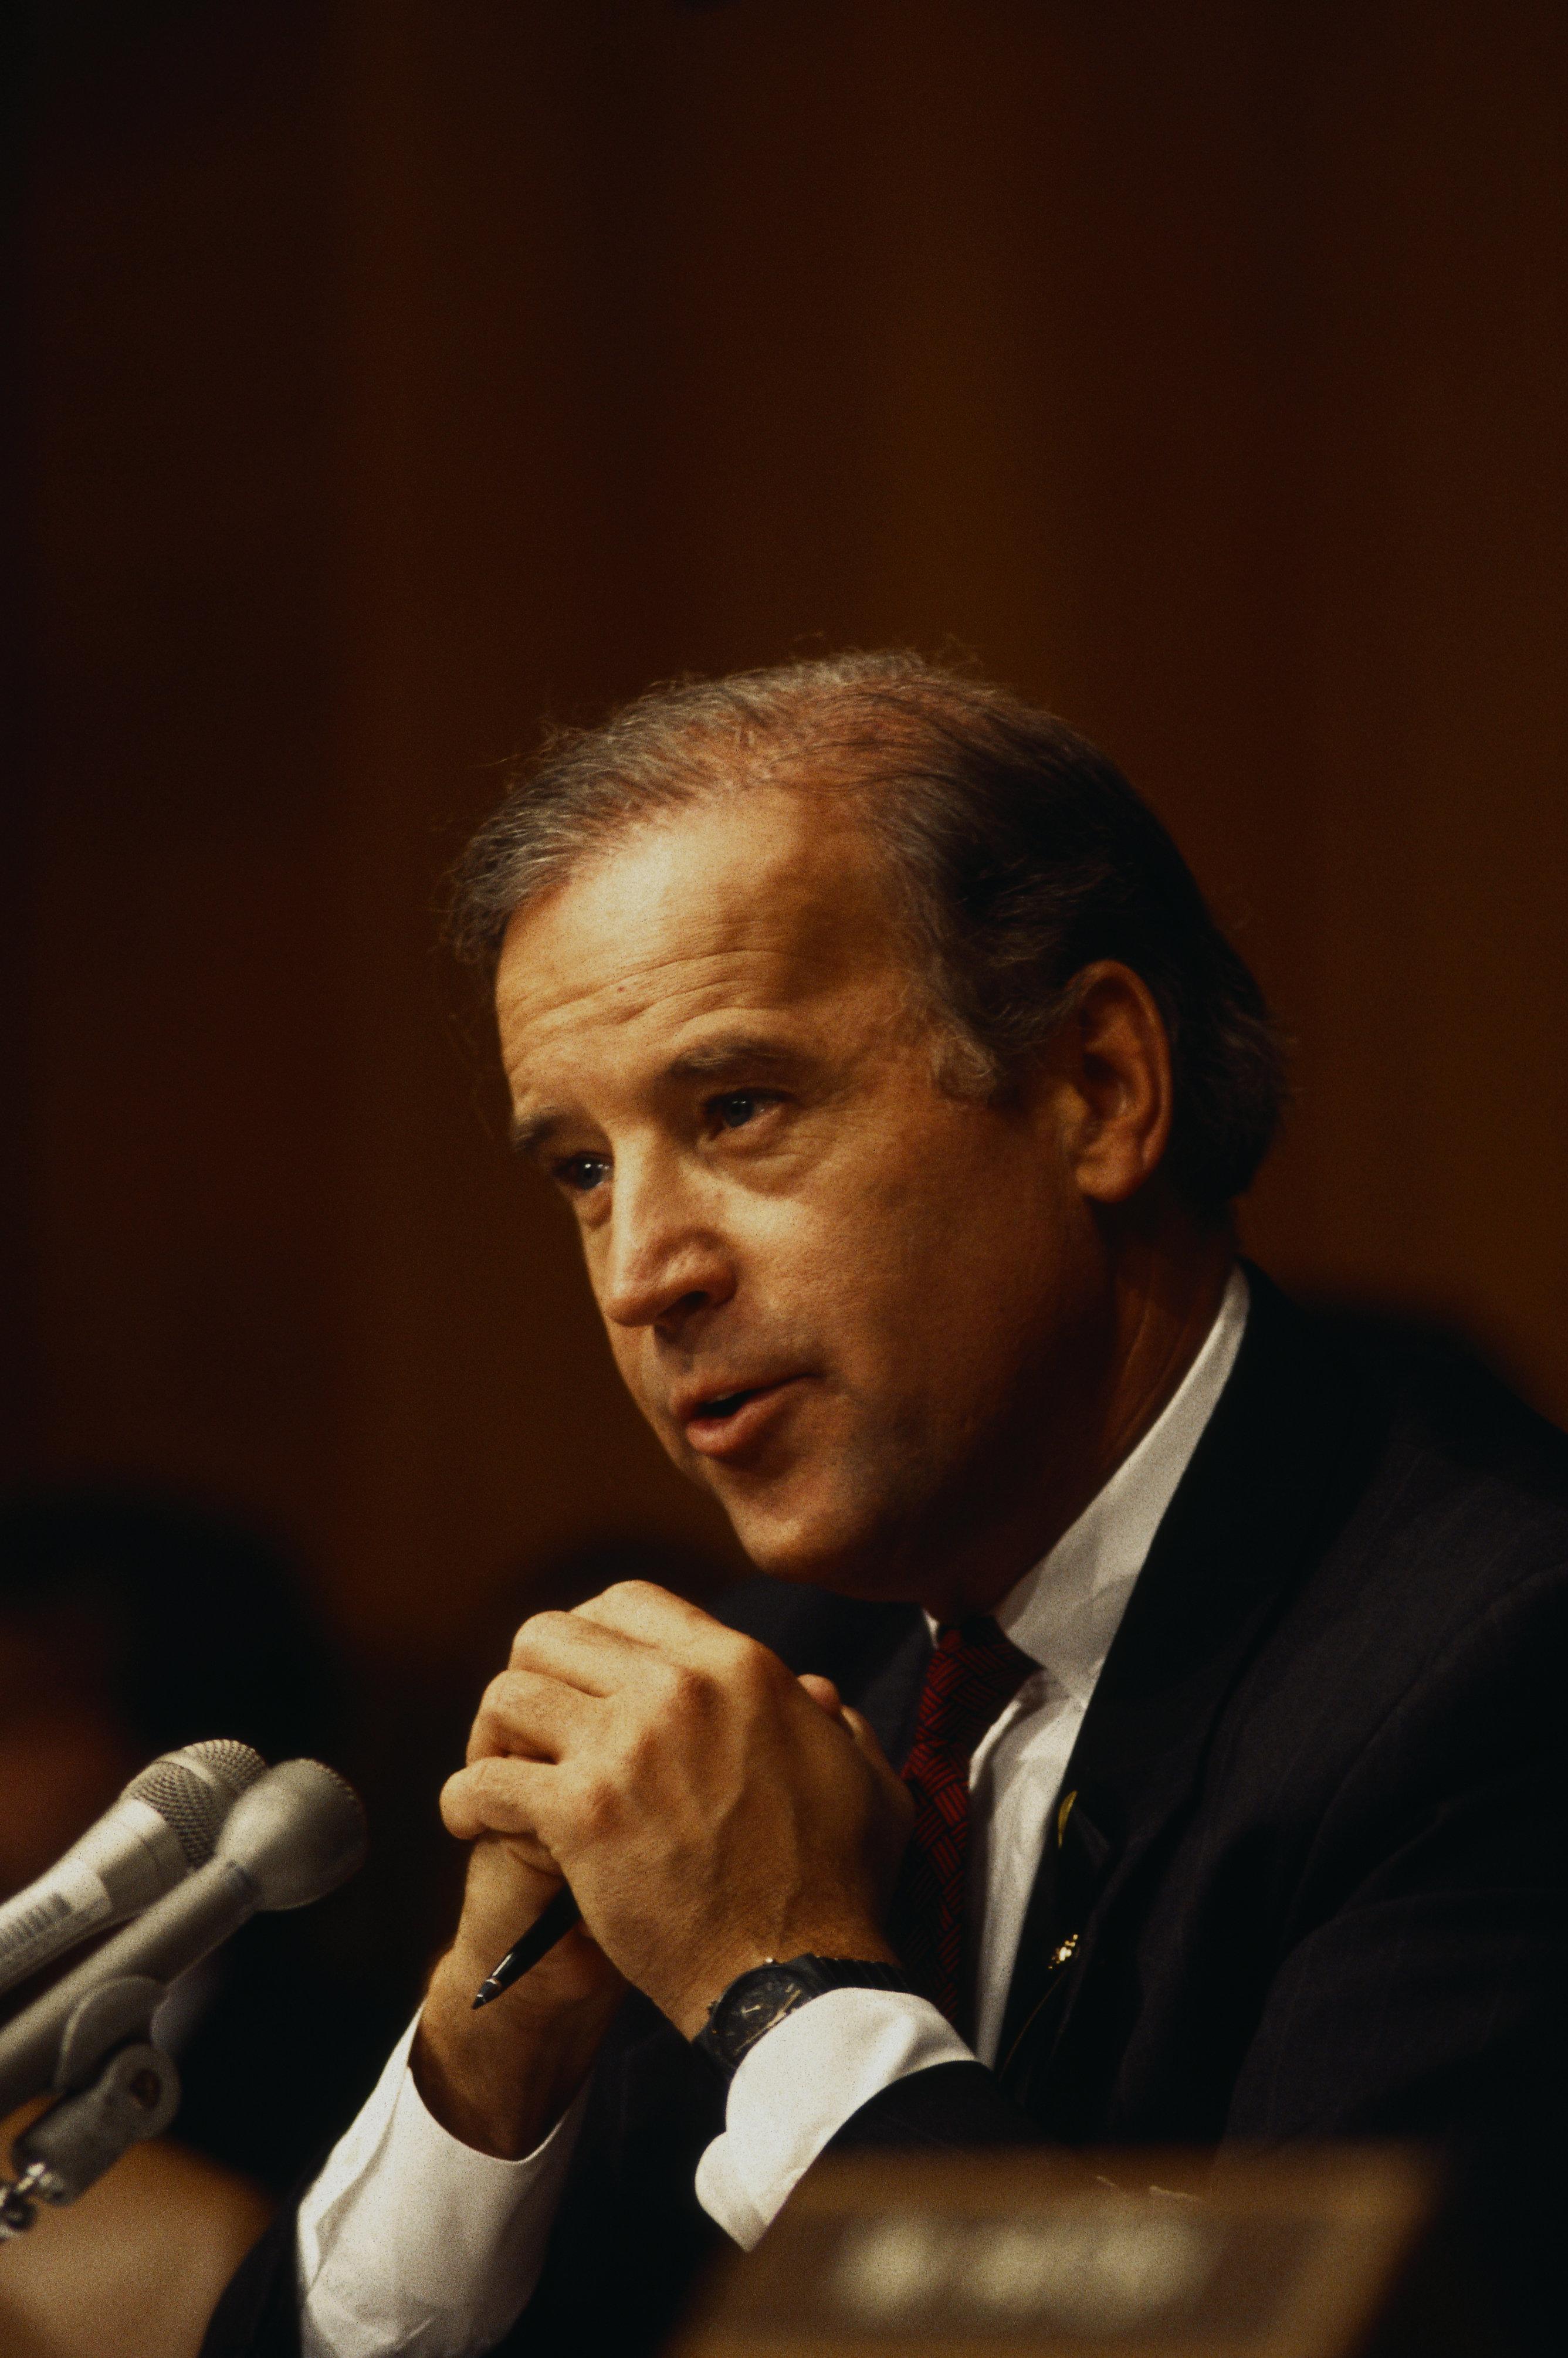 Senator Joe Biden in the 1990s.